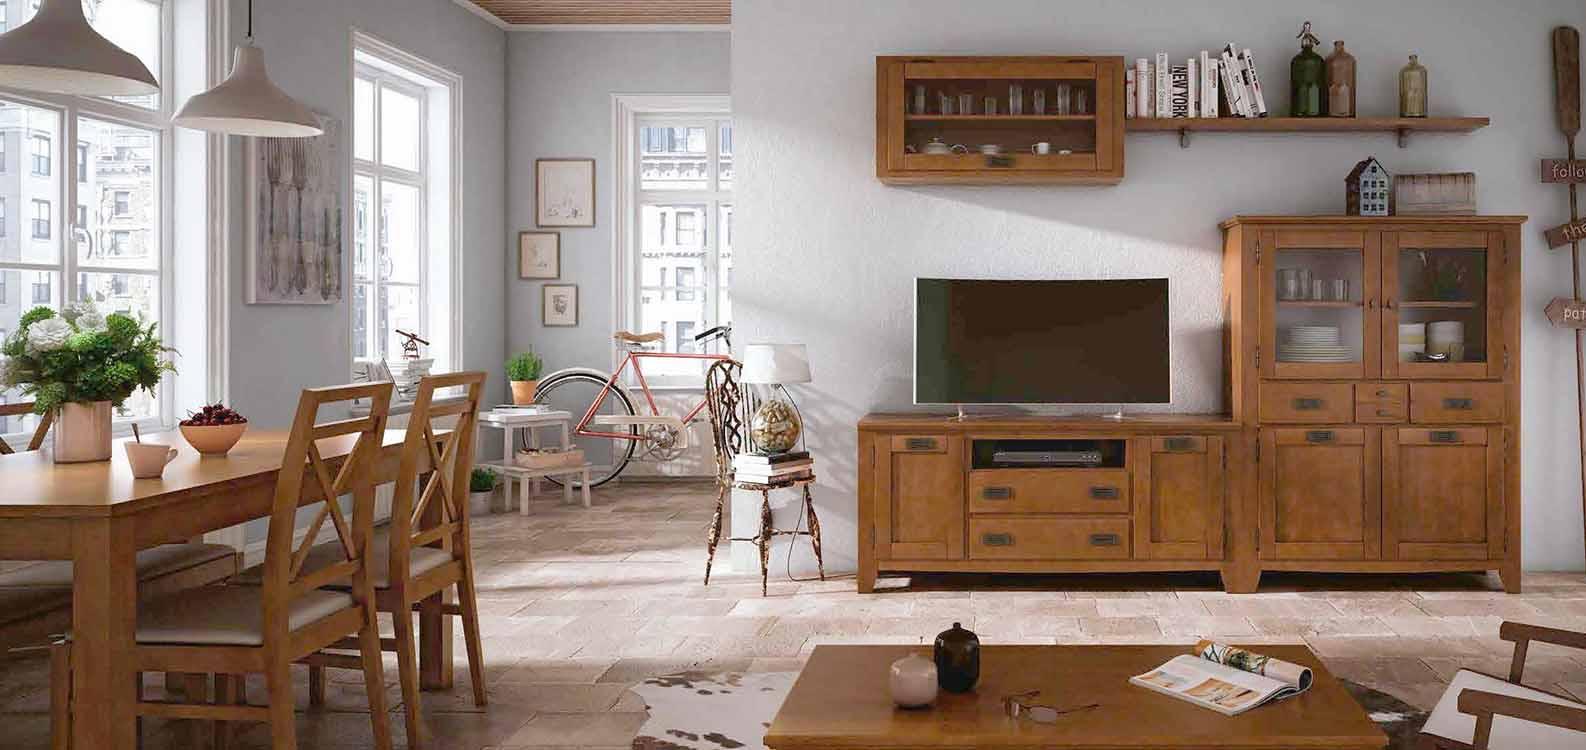 Muebles mu oz cat logo de muebles salones cl sicos for Salones clasicos actualizados